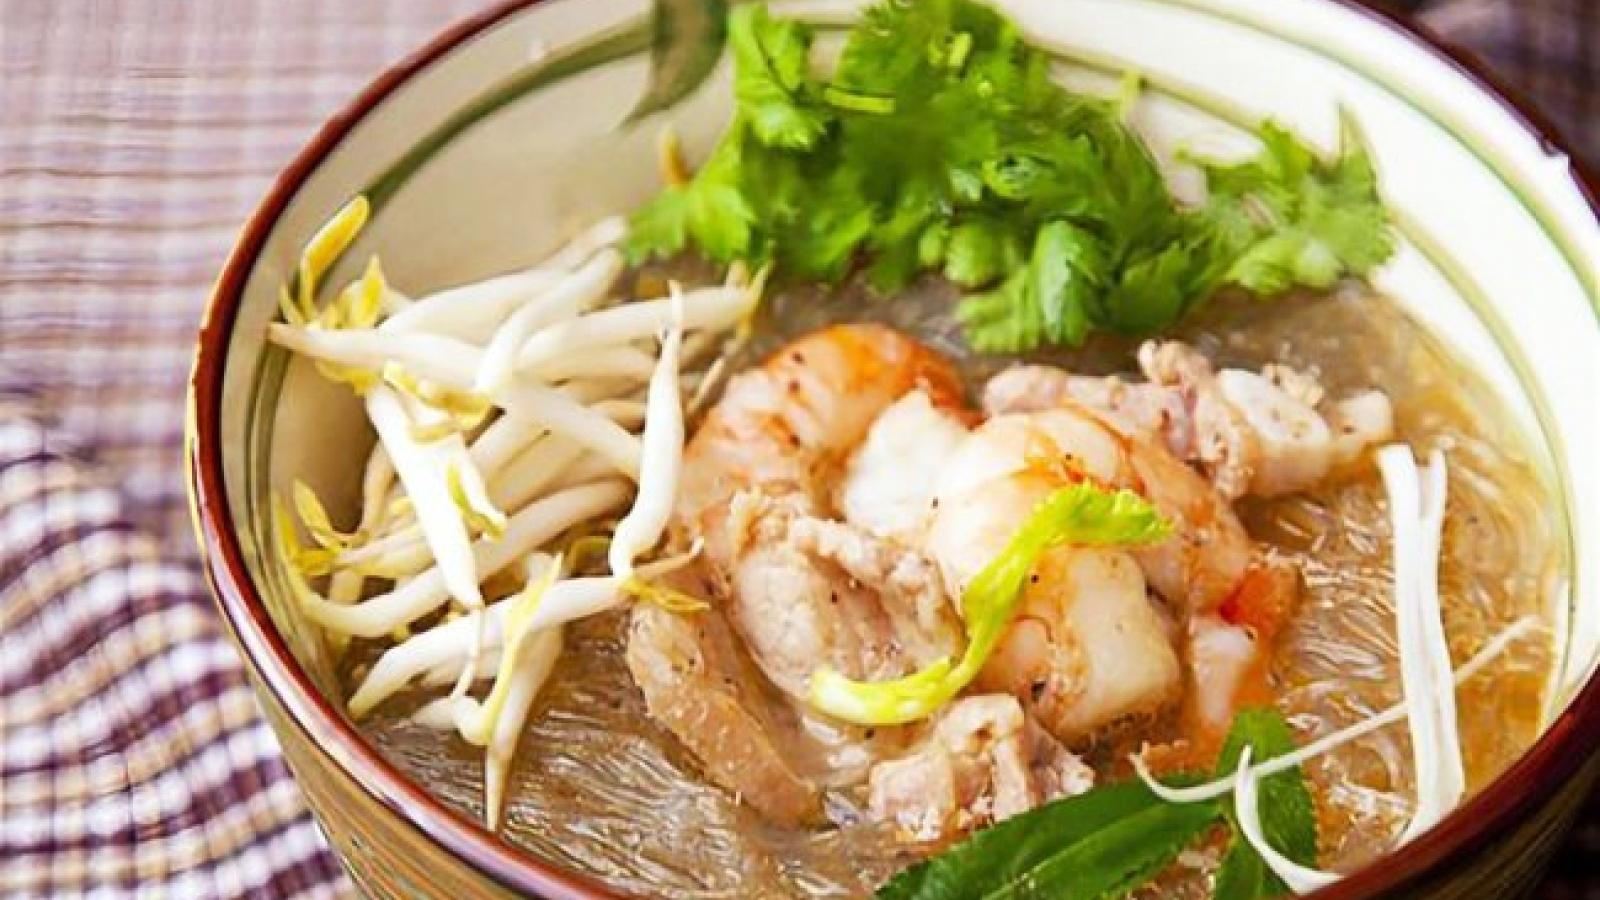 Hai Phong-style shrimp vermicelli soup